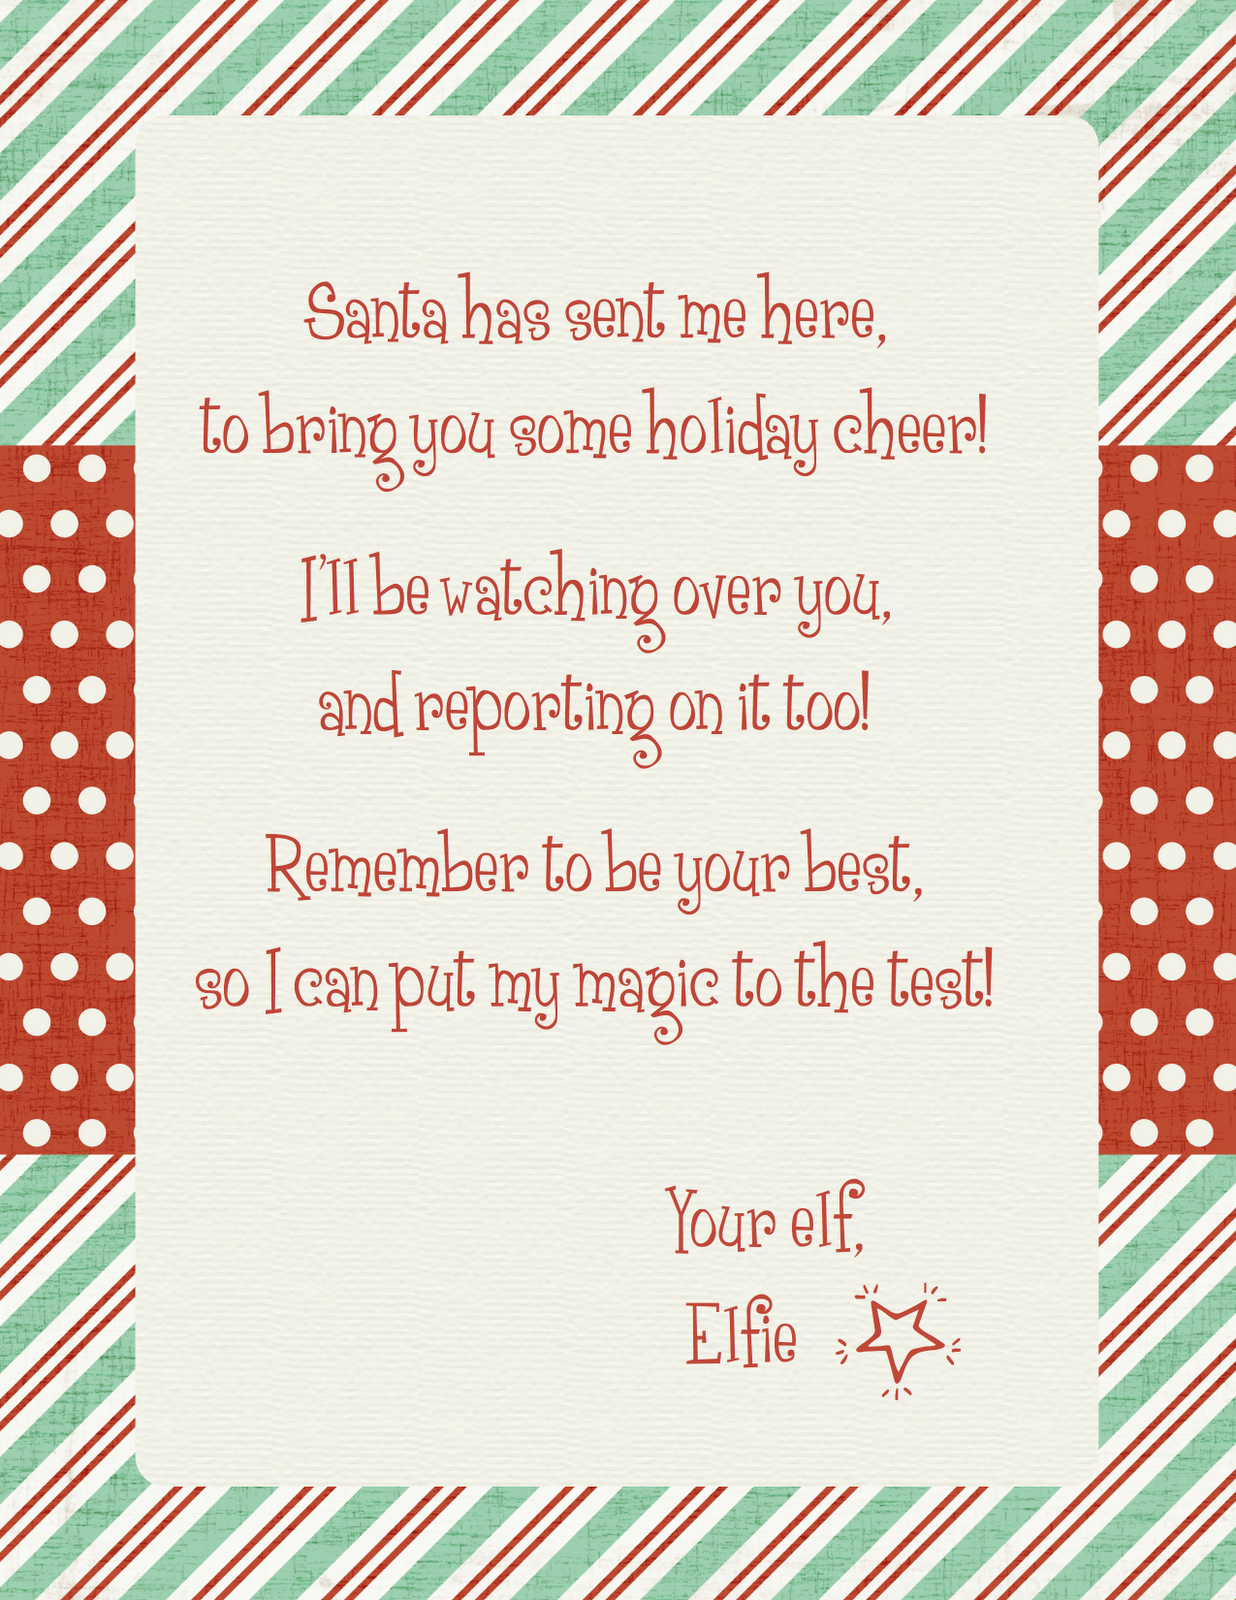 Elf on the Shelf Arrival Letter Holidays Pinterest Inspiration